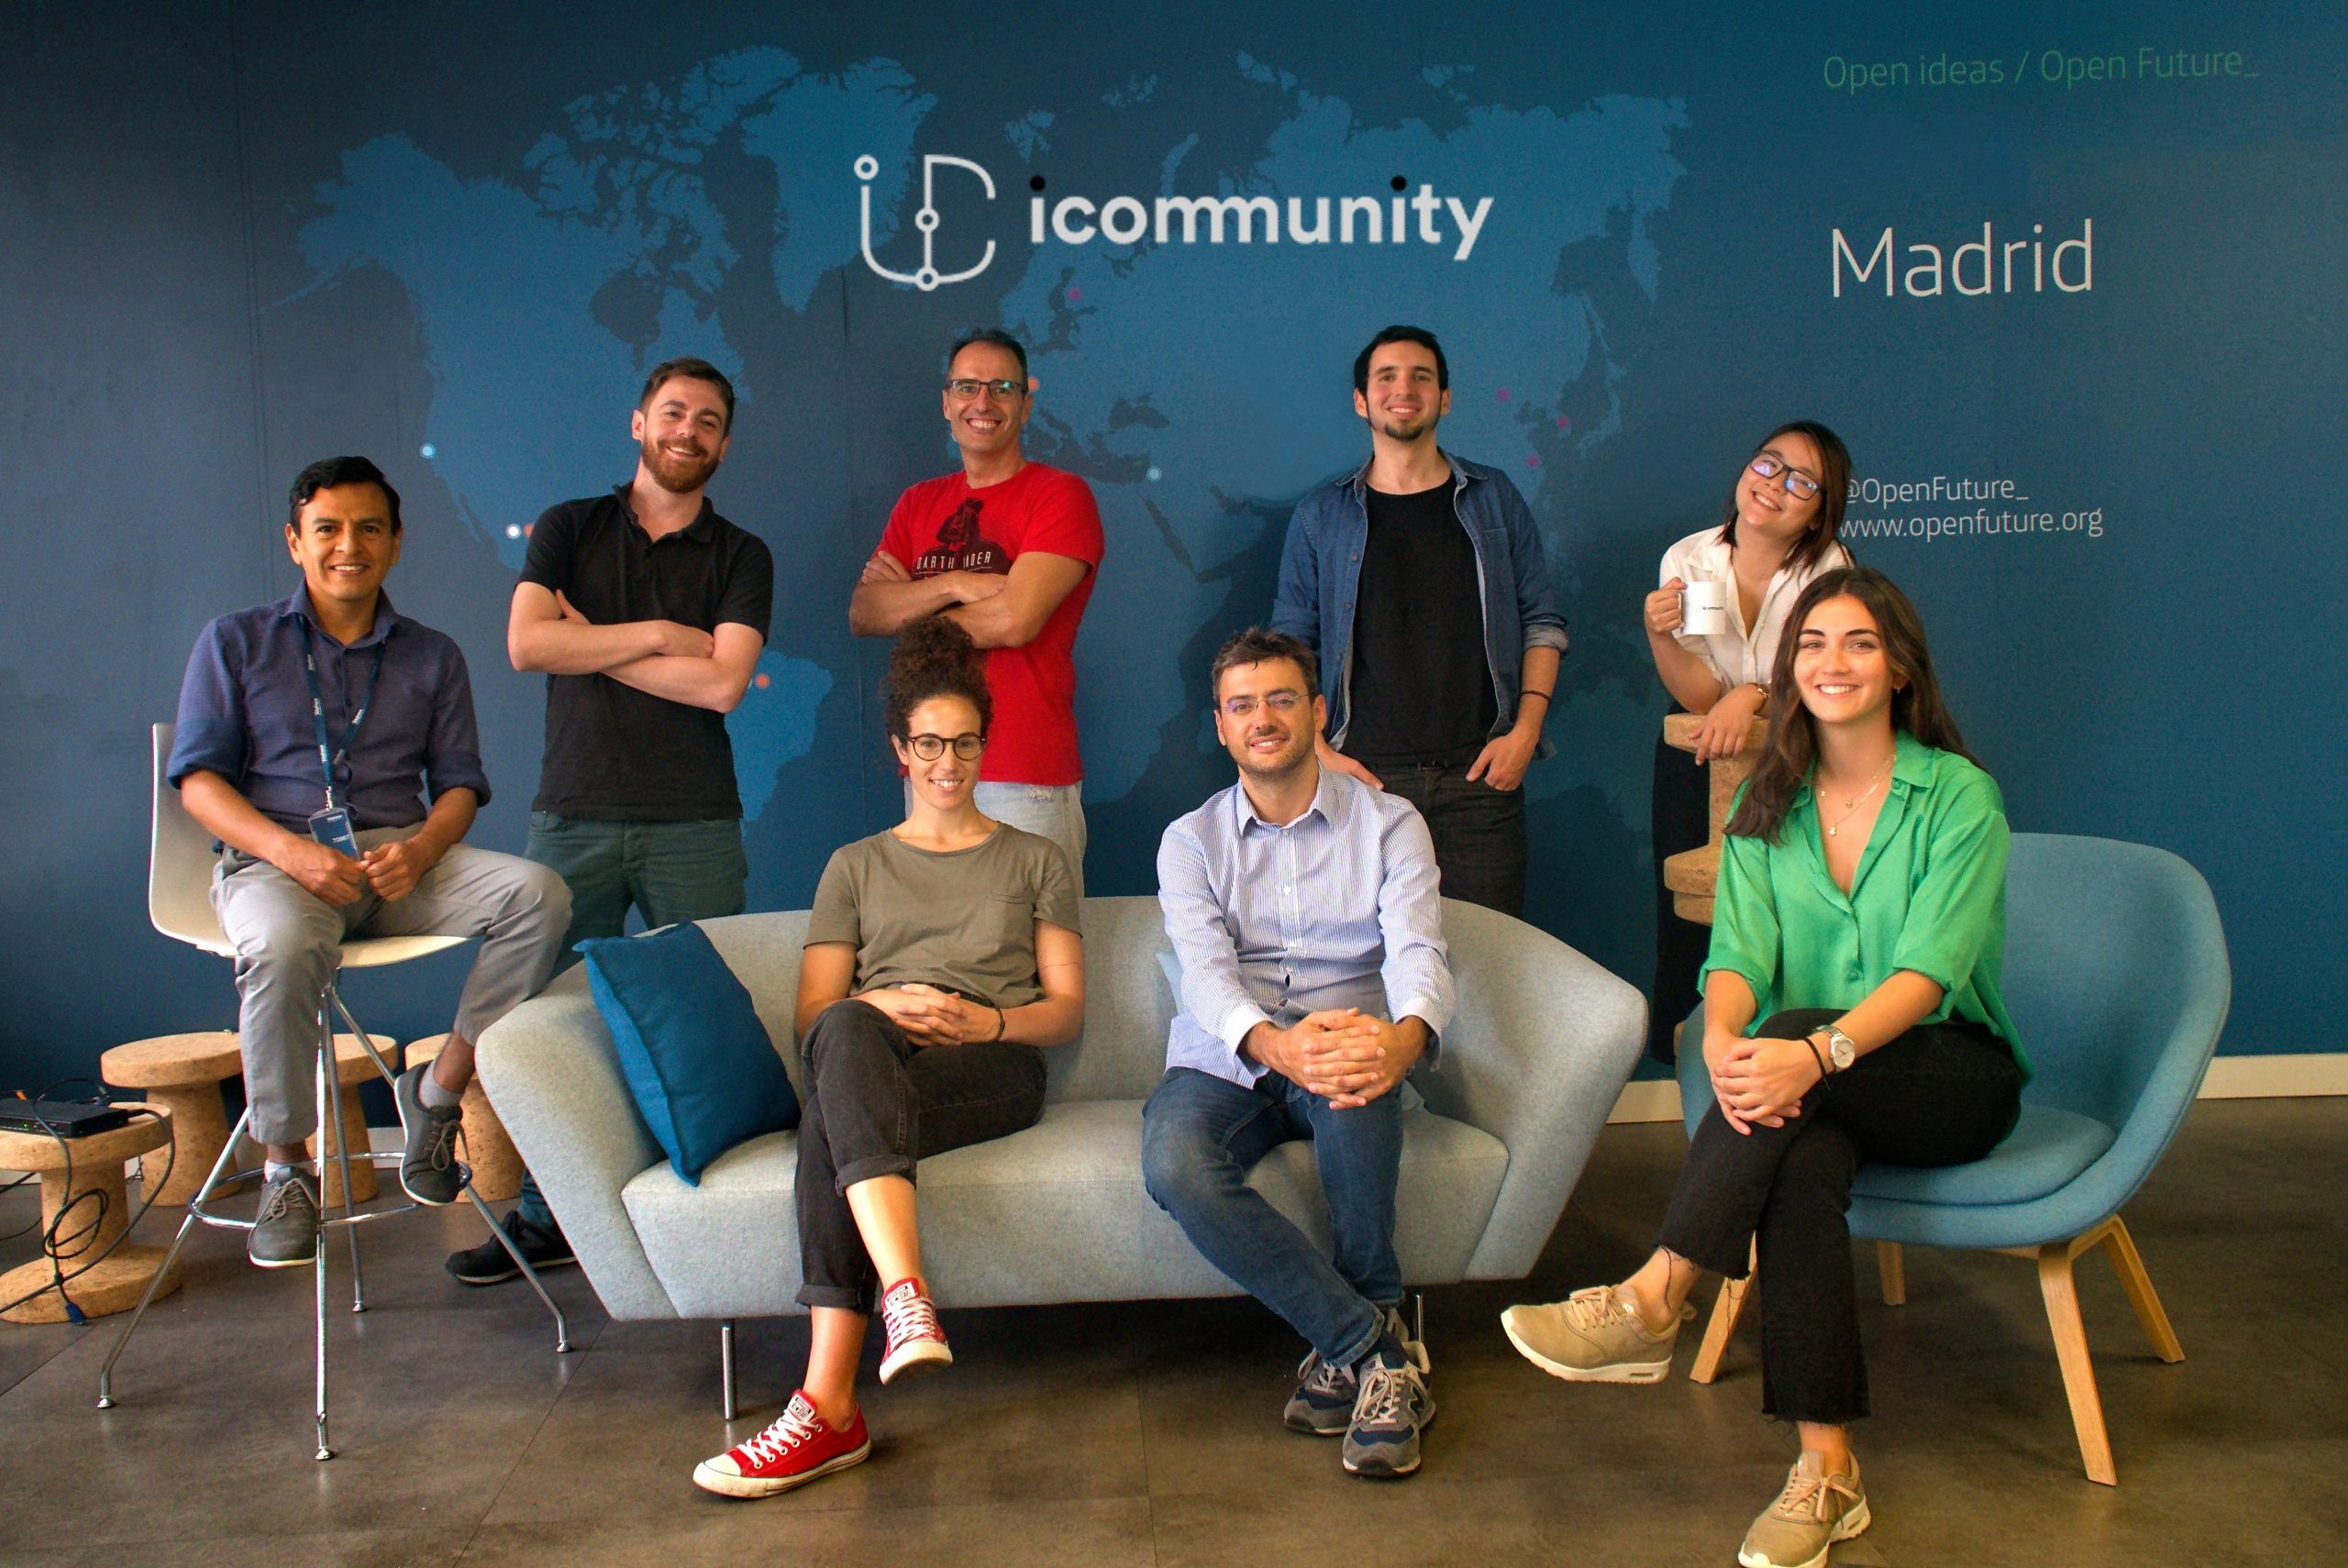 https://static.comunicae.com/photos/notas/1228697/1632355010_Foto_equipo_iCommunity_Labs_scaled.jpg